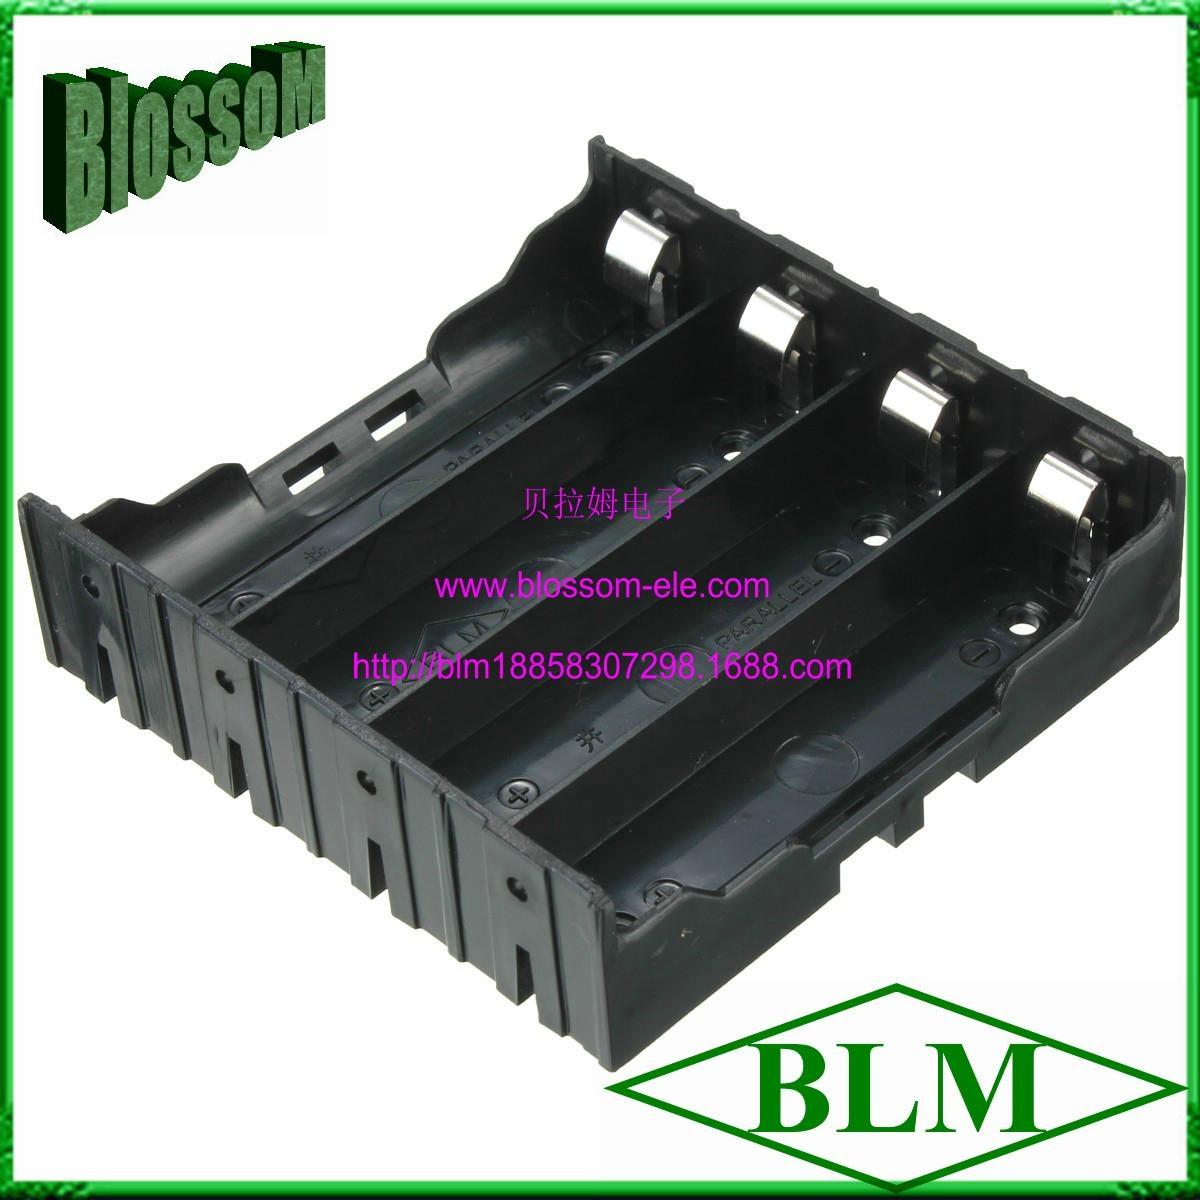 Battery Holder for Li-ion 4X18650 Size Battery  2